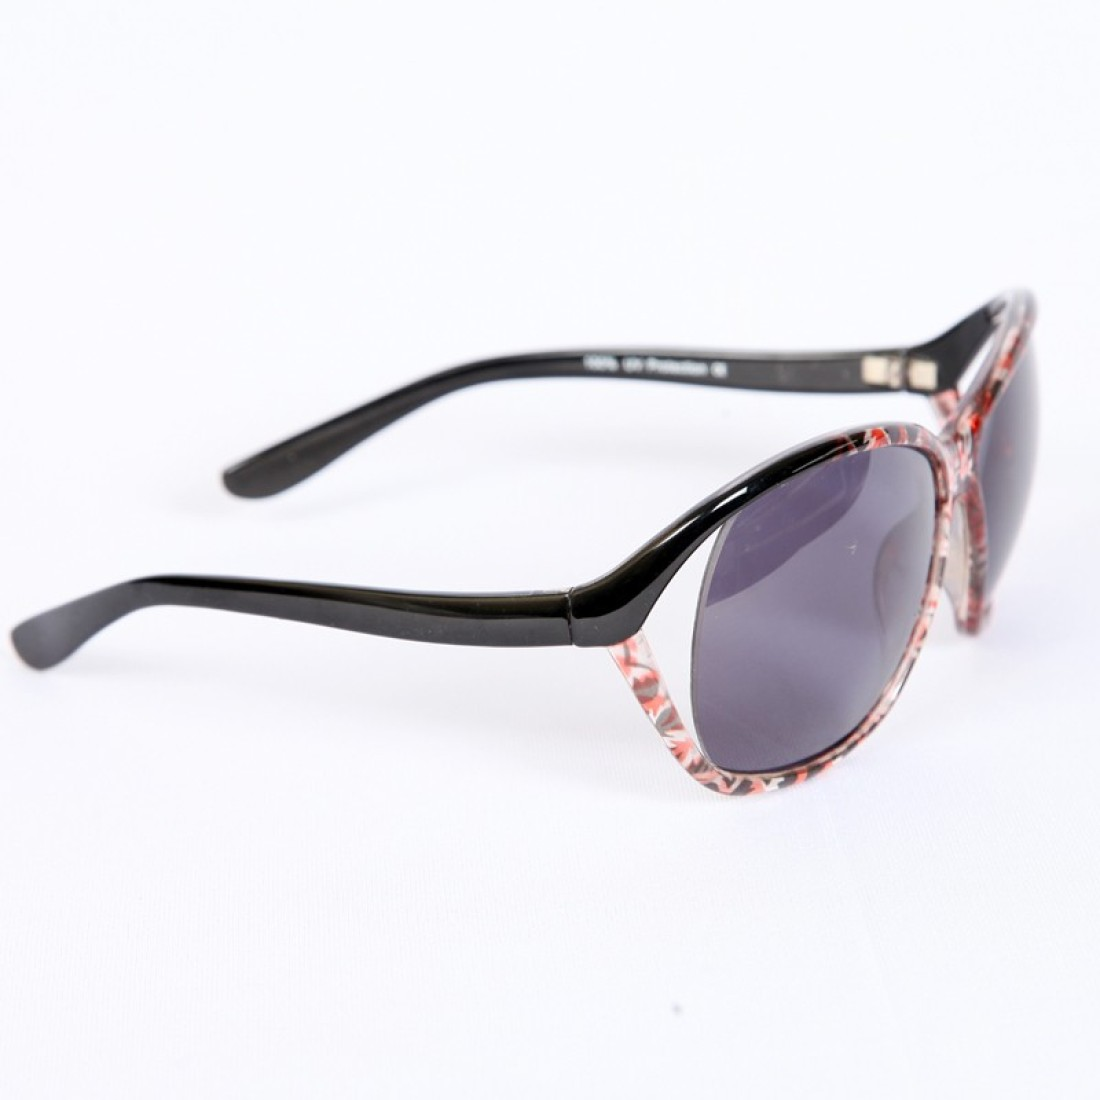 c08e95f75283c Reebok i30034 Necktarine Sports Sunglasses - Best Price in India ...